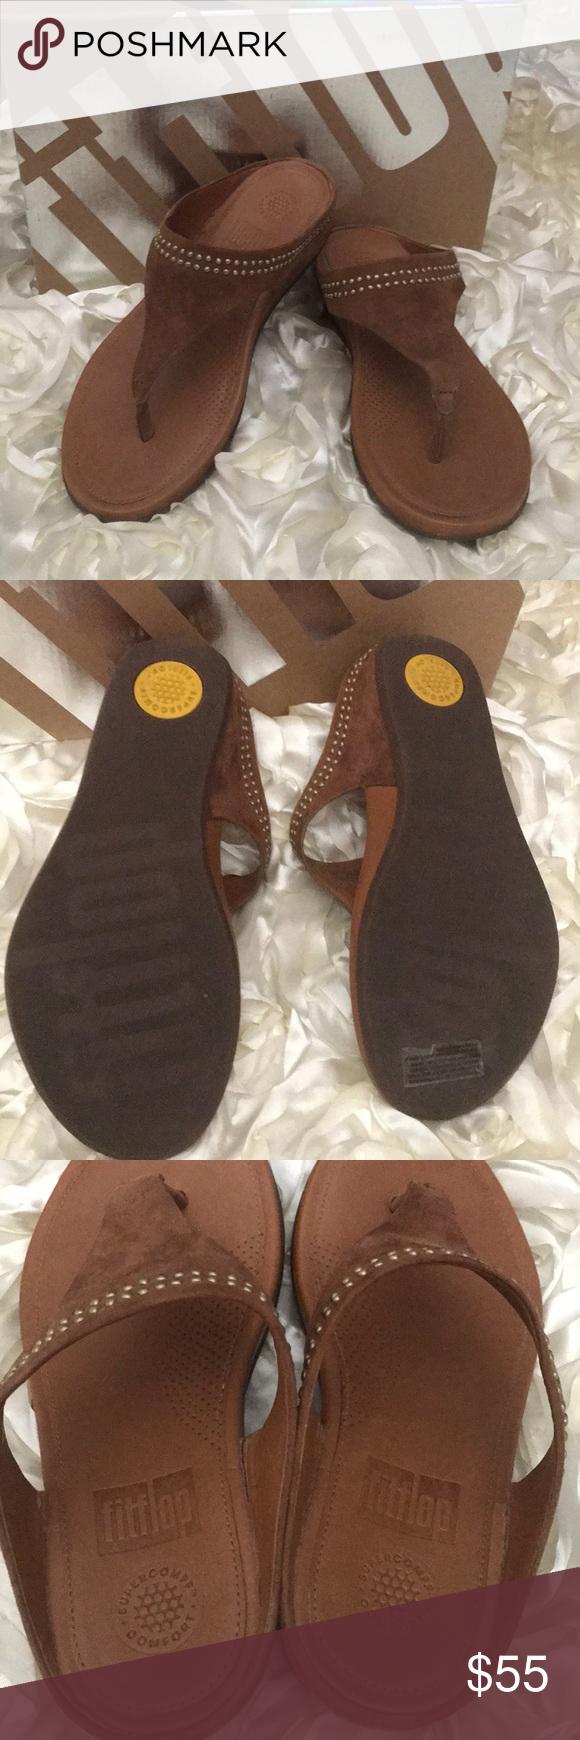 ac10d2fa903cc Fitflop Banda Sandals Brand new Banda Toepost with studs. Never worn. Tan  color